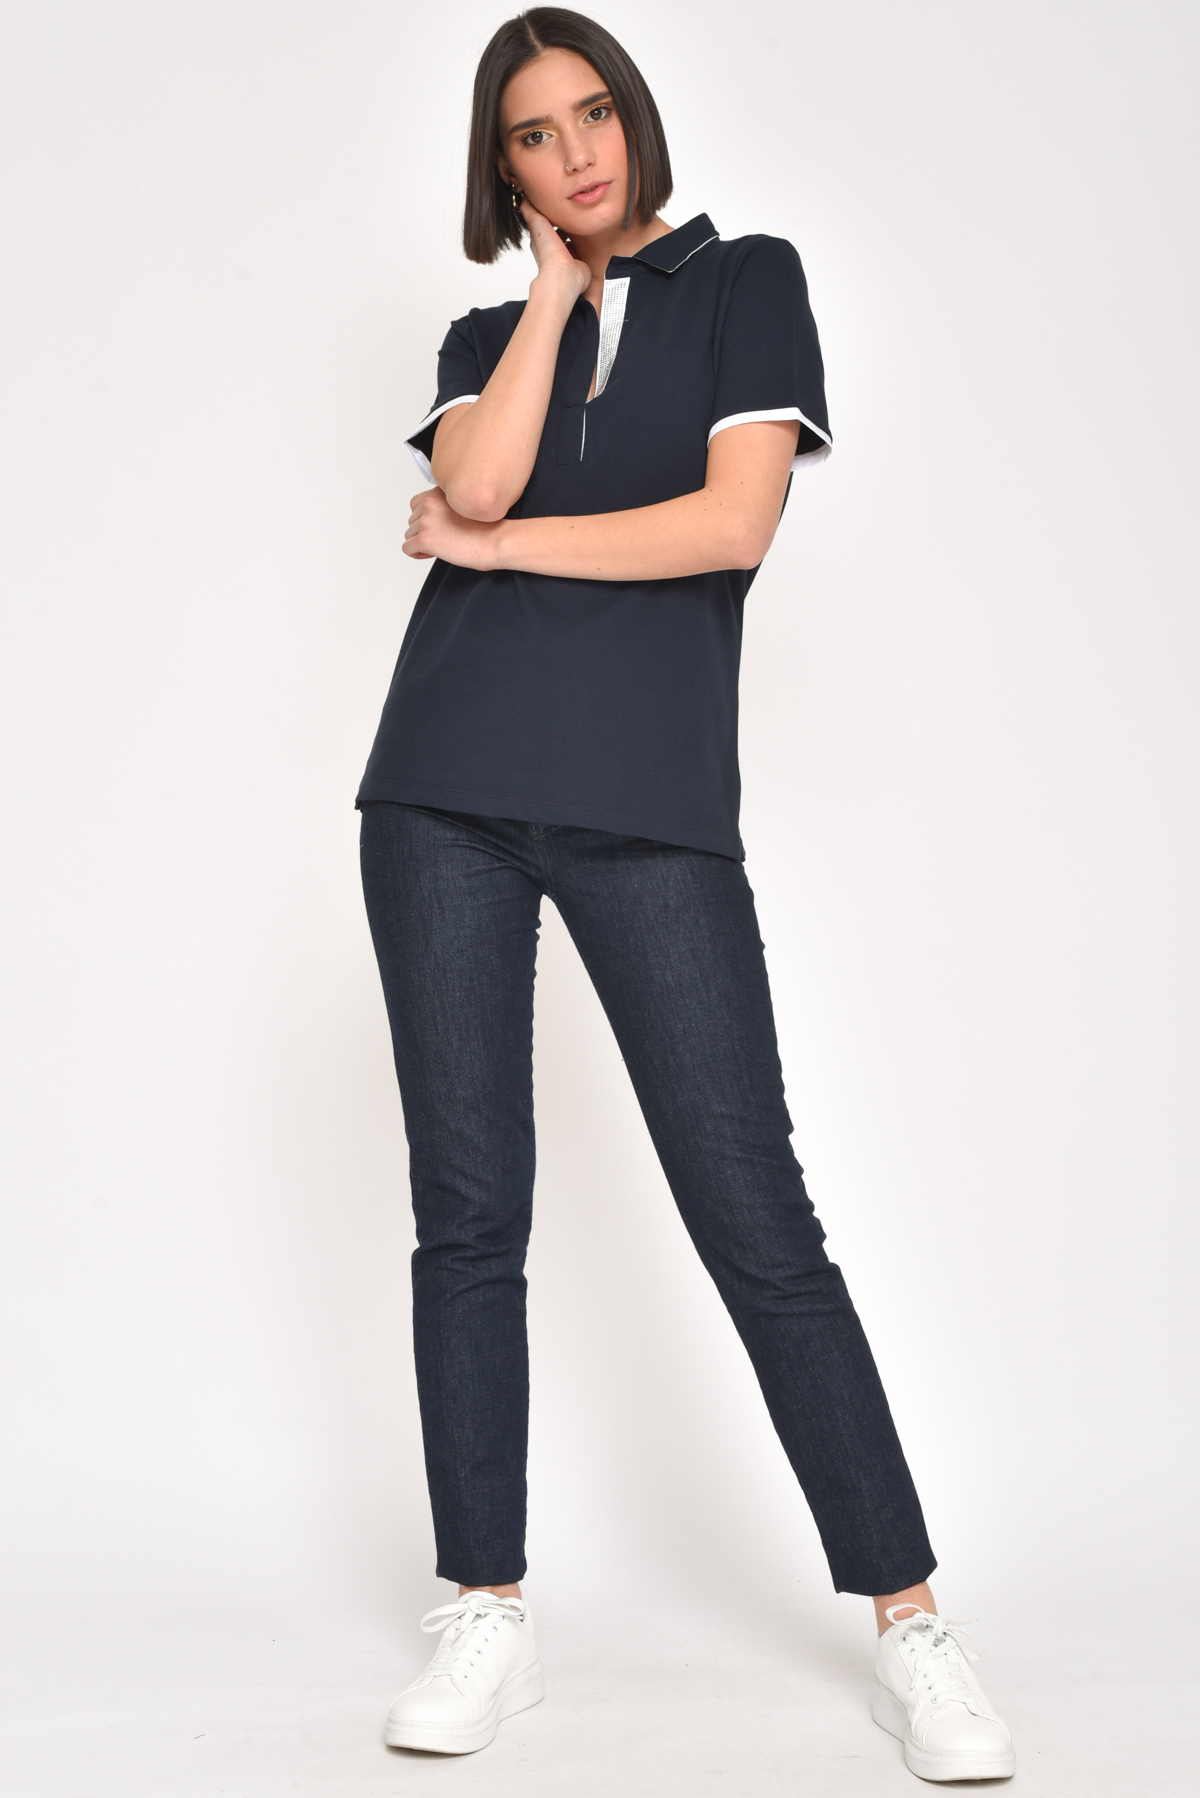 T-SHIRT CON COLLO A CAMICIA for women - BLUE - Paquito Pronto Moda Shop Online